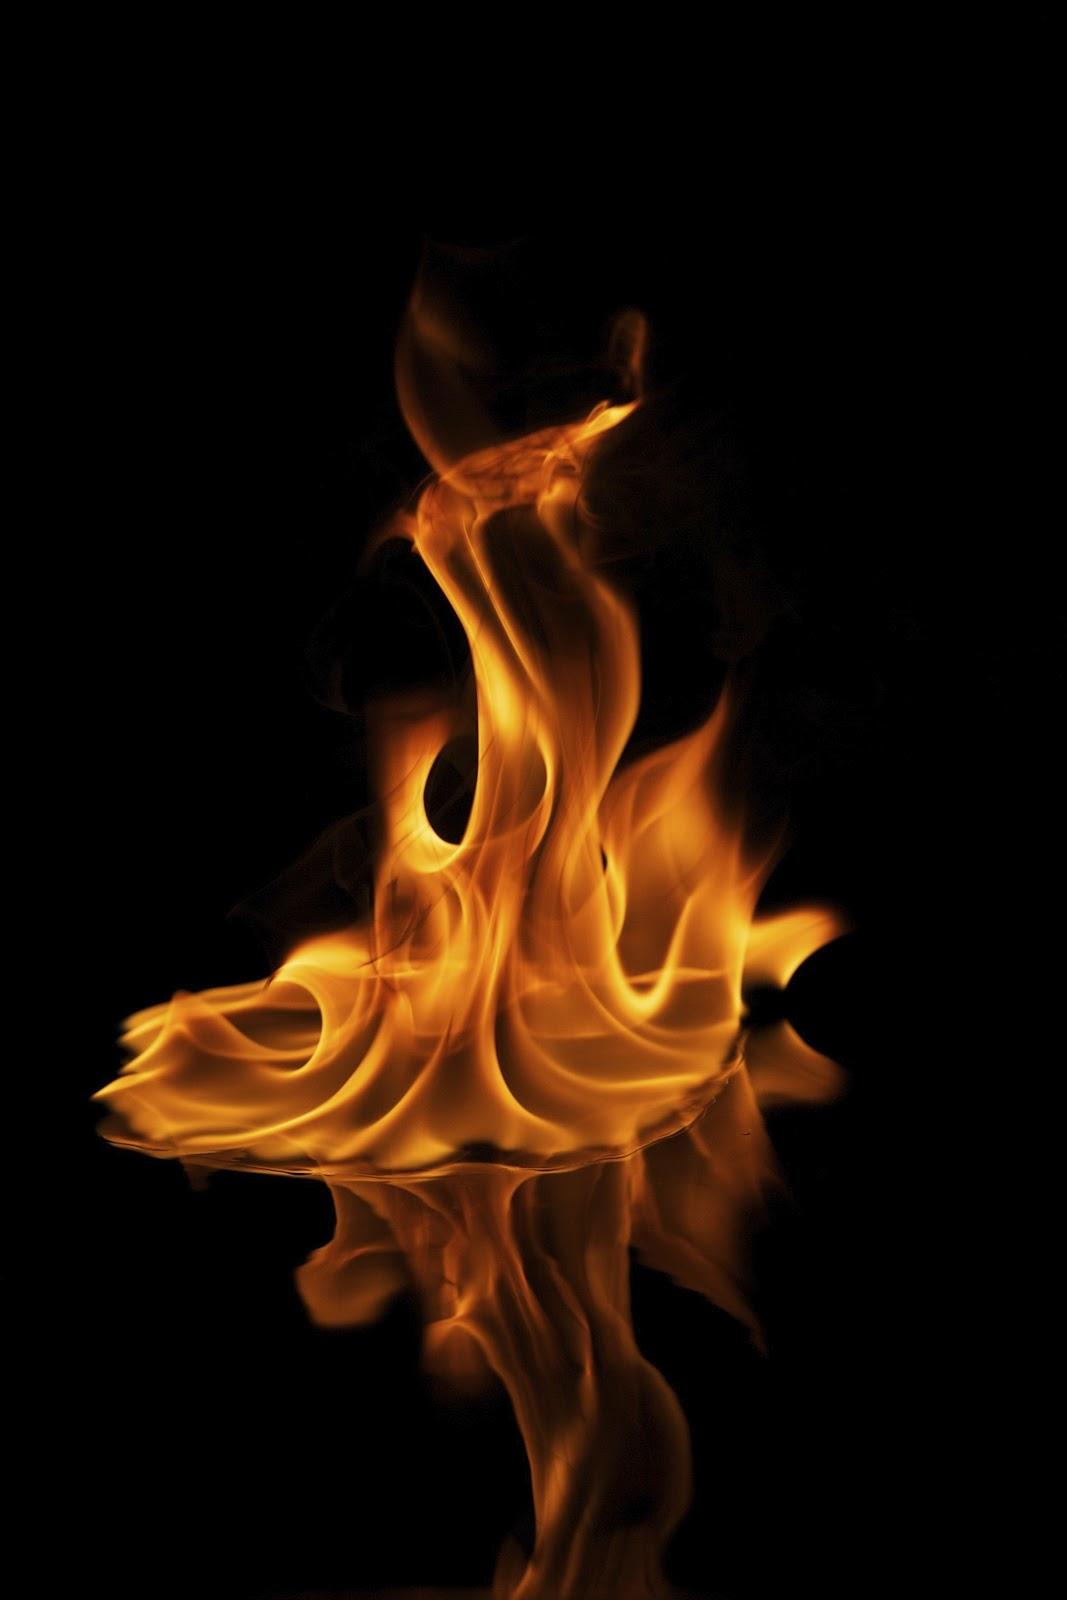 FIRE-image.jpg